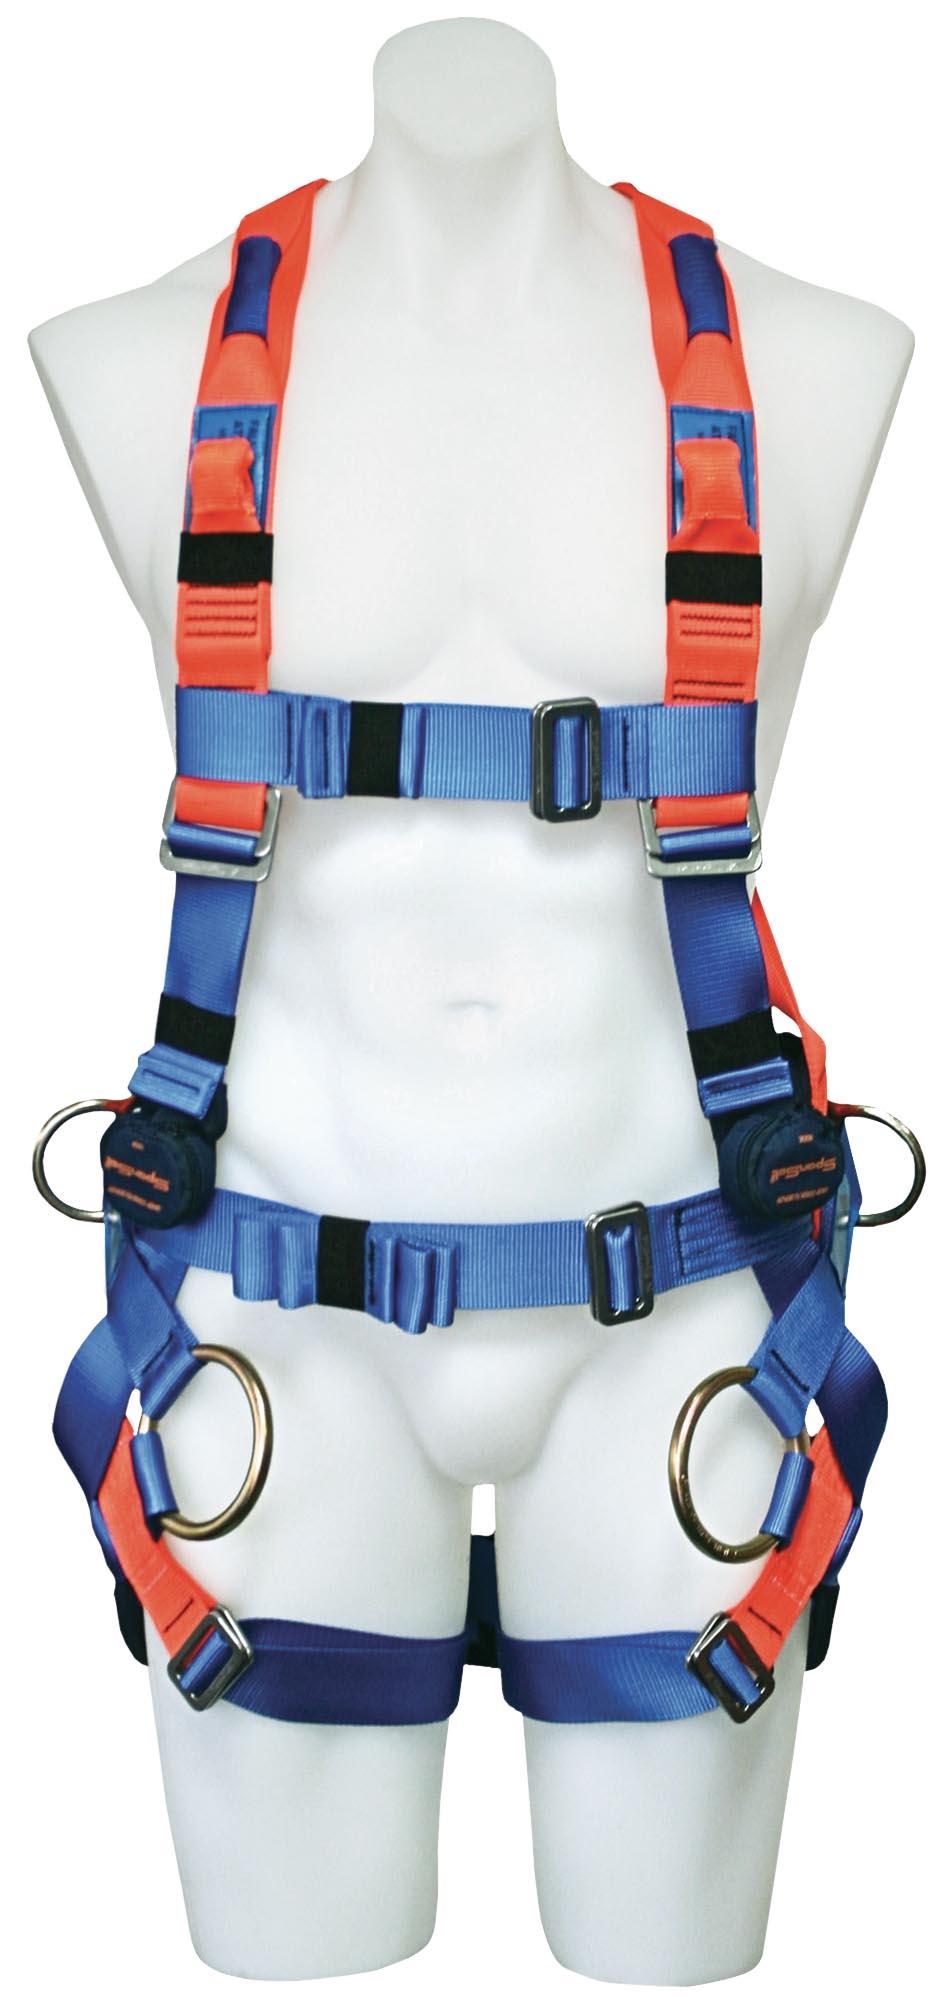 1500 ERGO Full Harness - Get Set Training Get Set Training